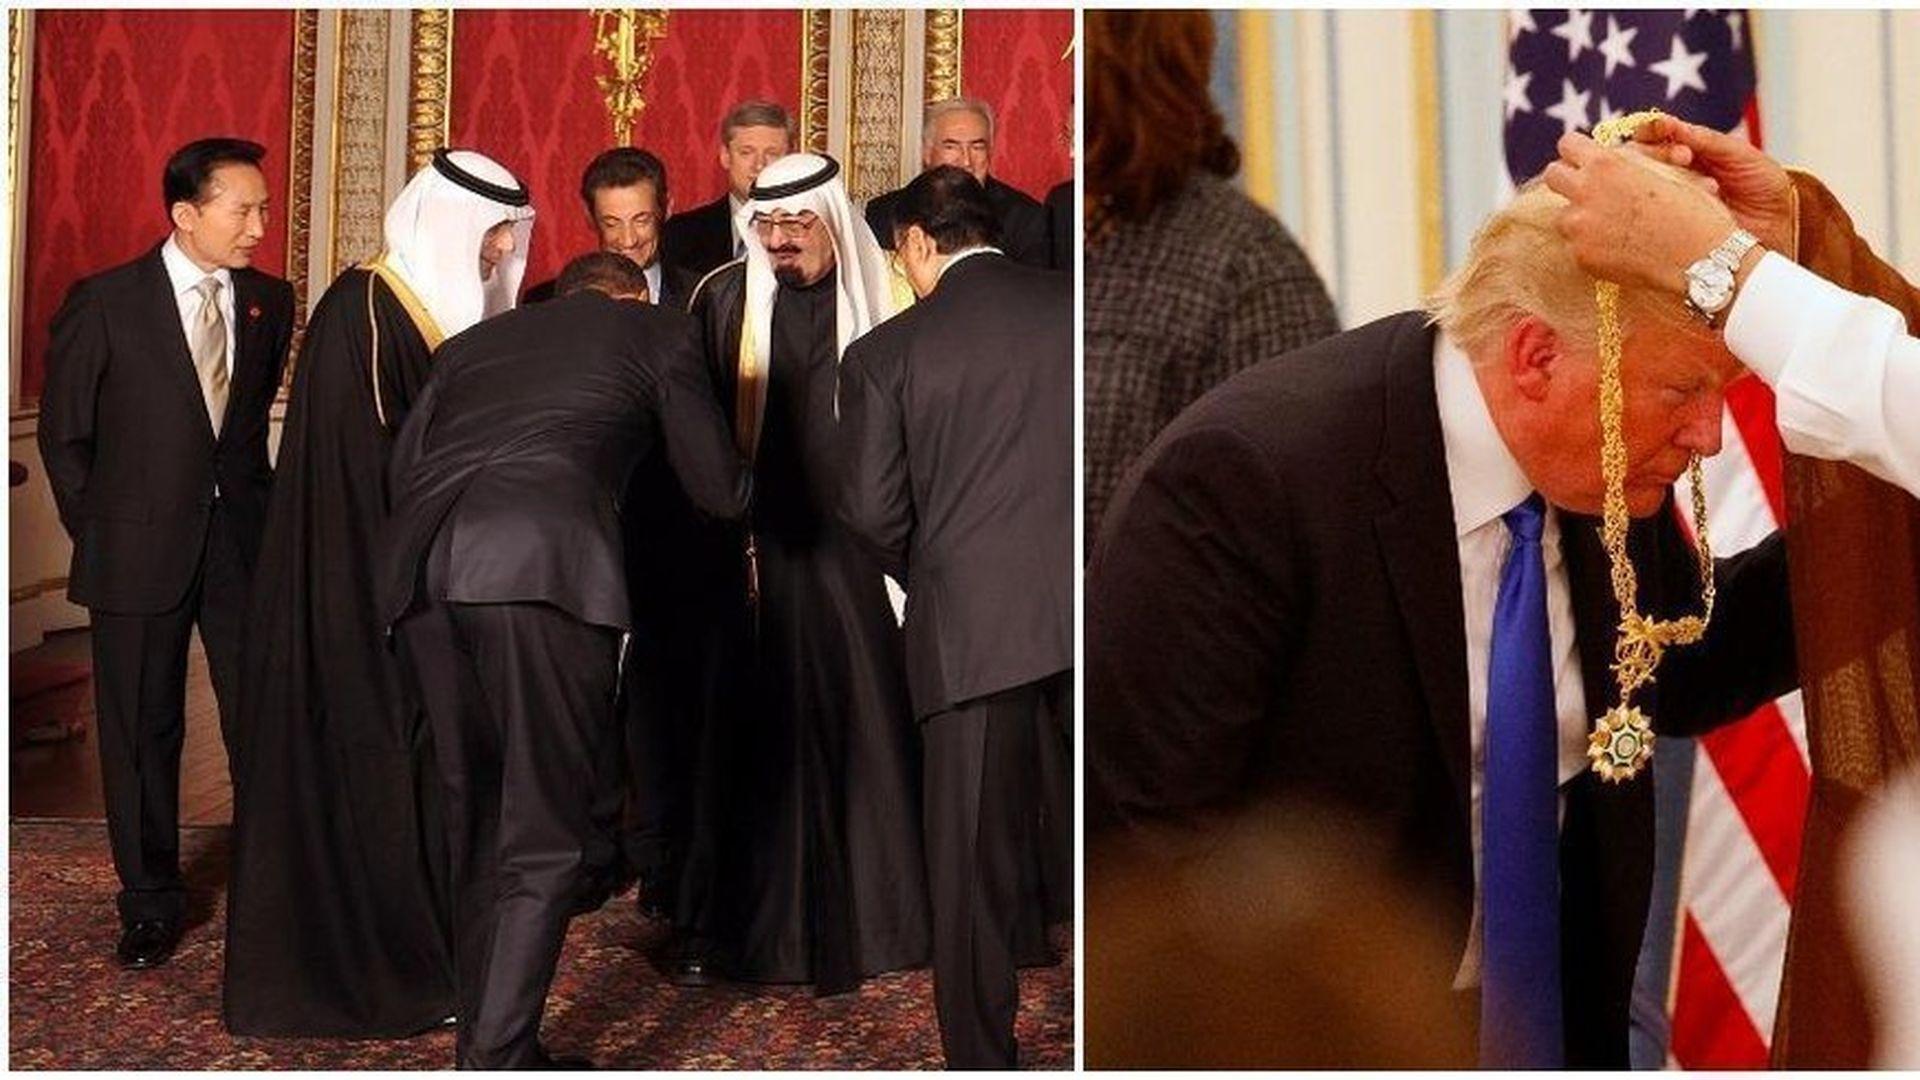 Conservative Media Coverage Gap On Trump Obama Bows Axios